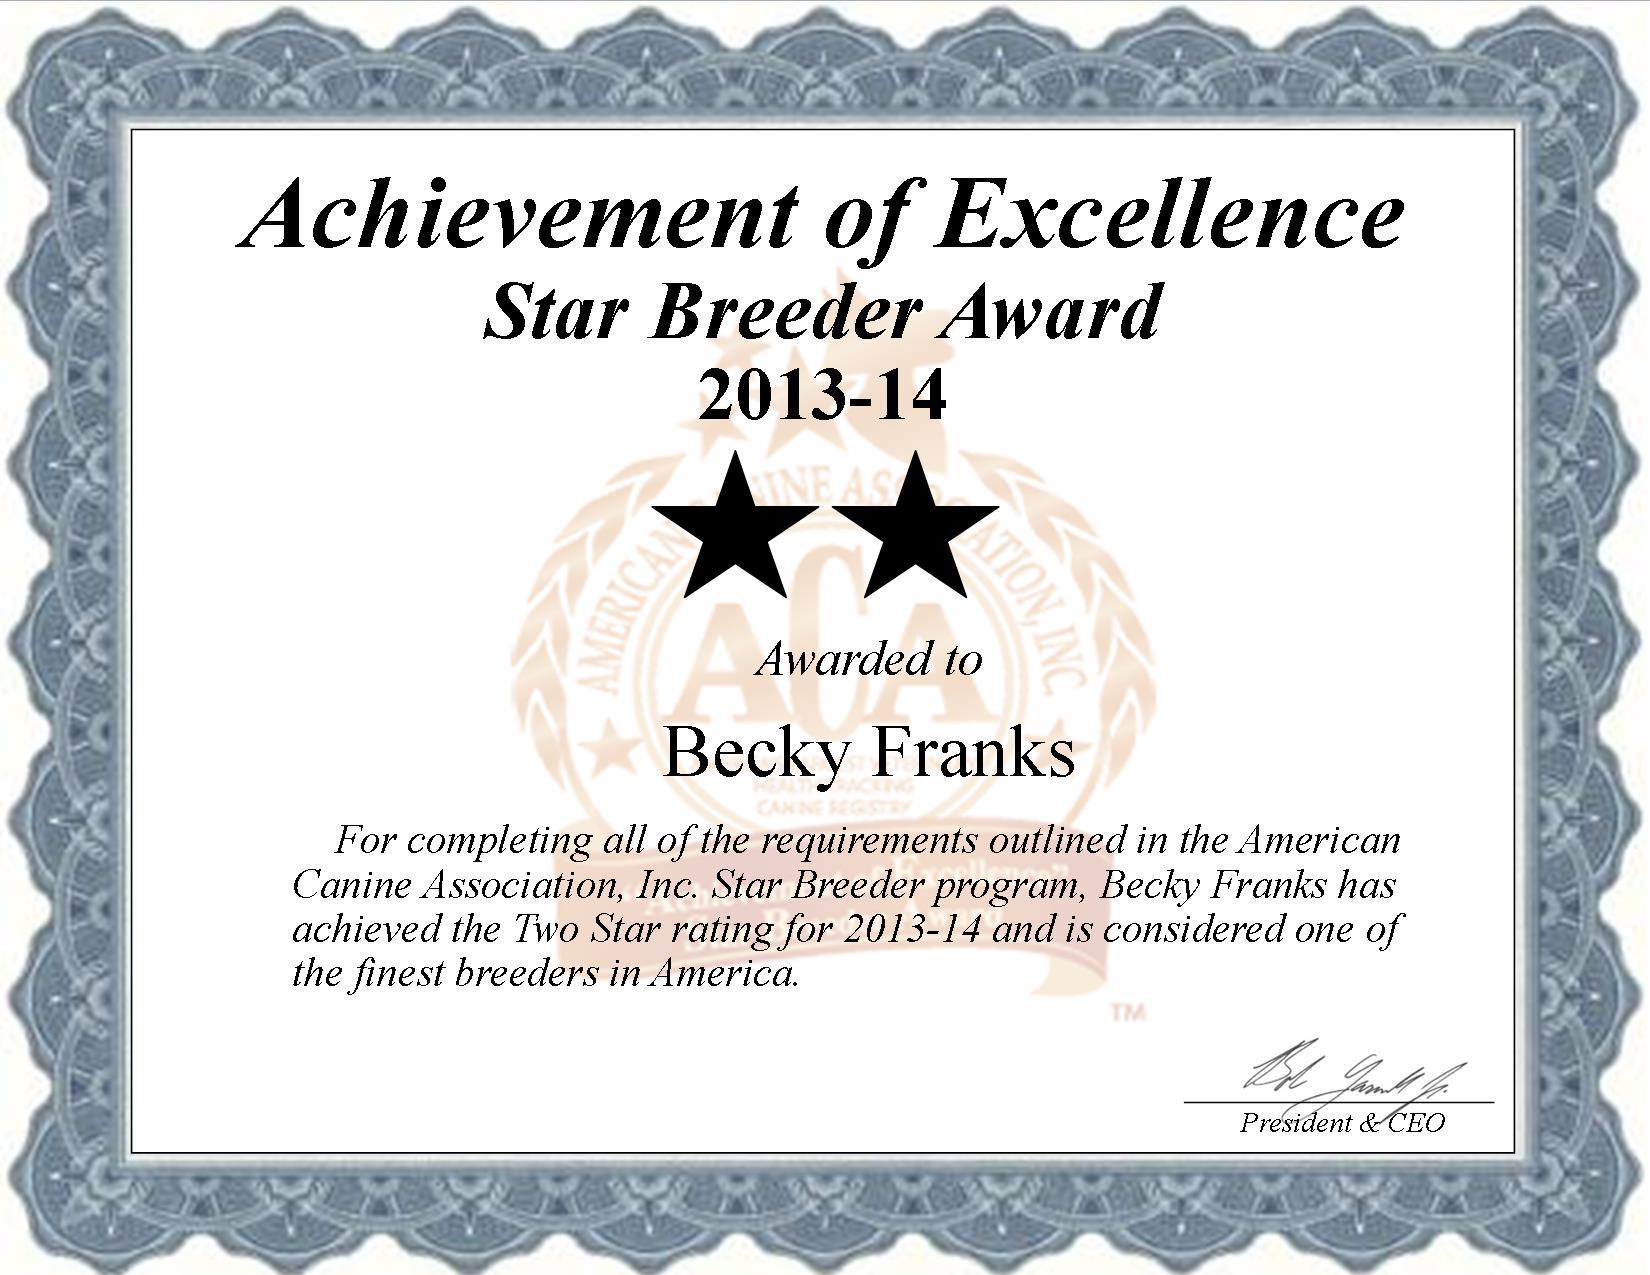 Becky, Kennel, Becky Franks, Rebecca, Rebecca Franks, Guy, Guy Franks, Kennel, breeder, star breeder, aca, star breeder, 2 star, antlers, oklahoma, ok, dog, puppy, puppies, dog breeder, dog breeders, oklahoma breeder, Becky Franks dog breeder